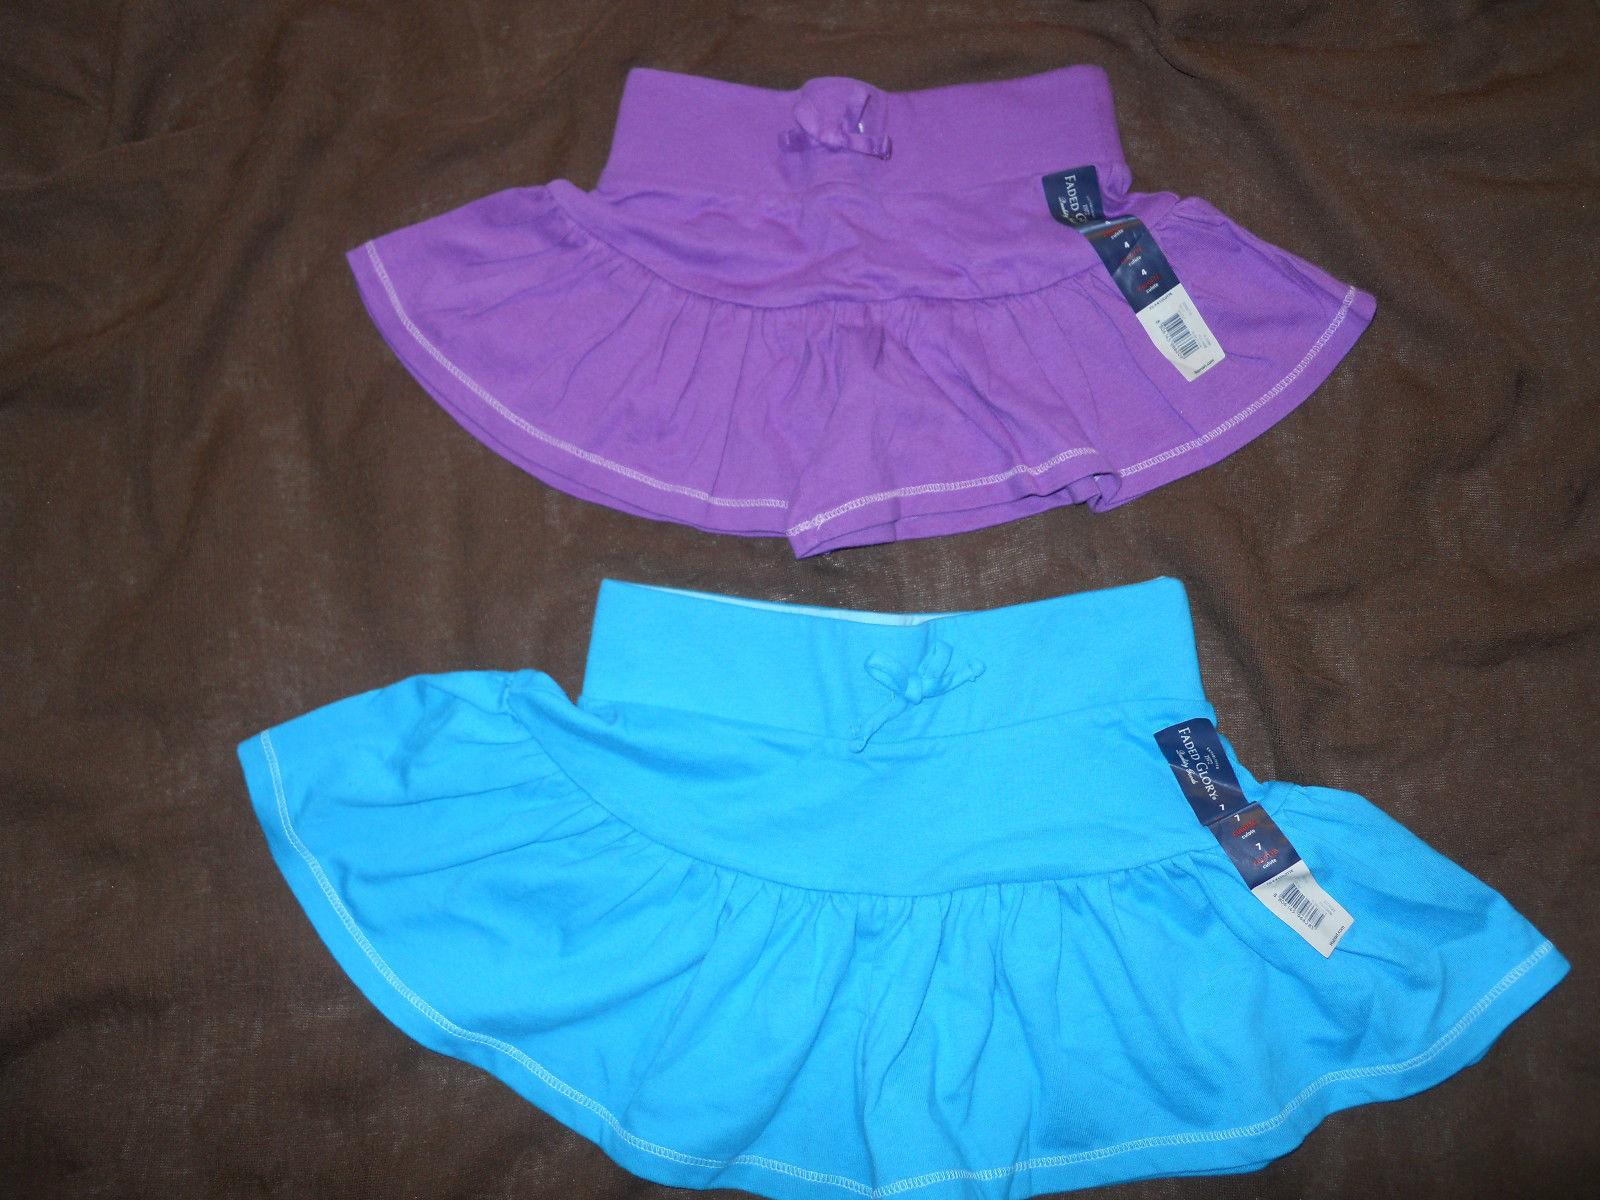 Girl Faded Glory Blue Scooter Skirt Skort Size XS S M L XL Denim NEW